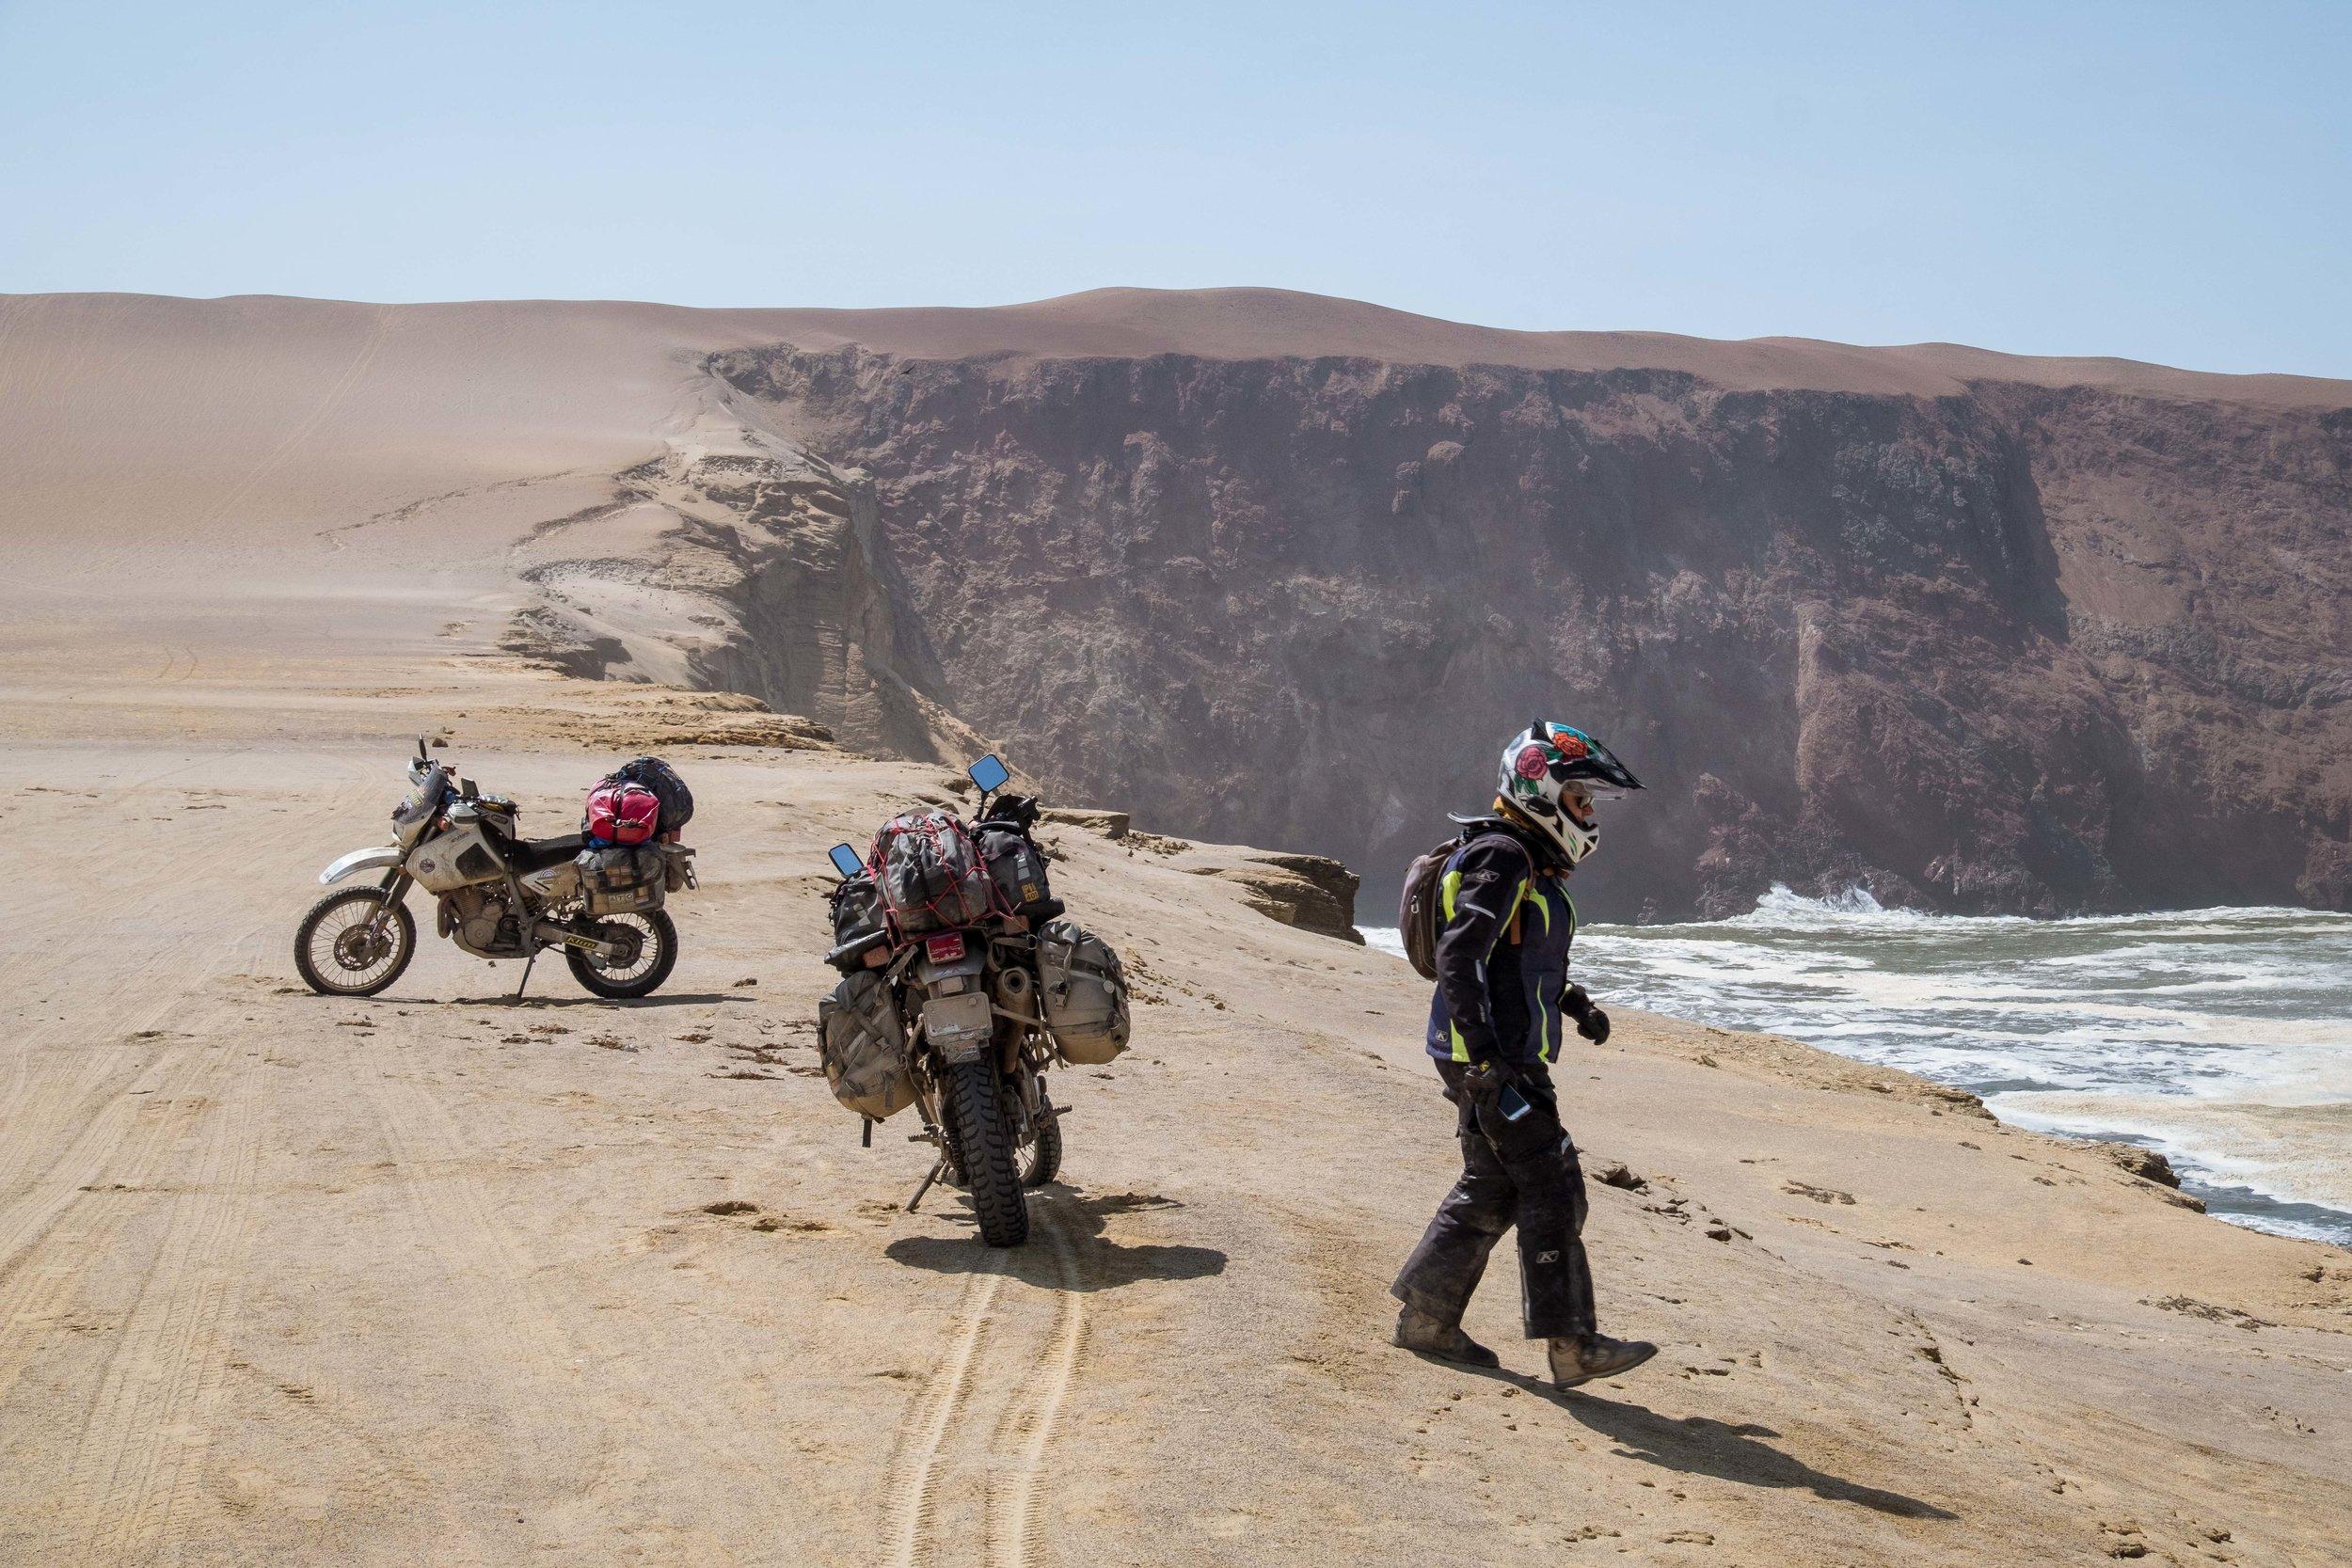 michnus-elsebie-olivier-pikipiki-overland-adventure-rider-radio-motorcycle-podcast-13.jpg